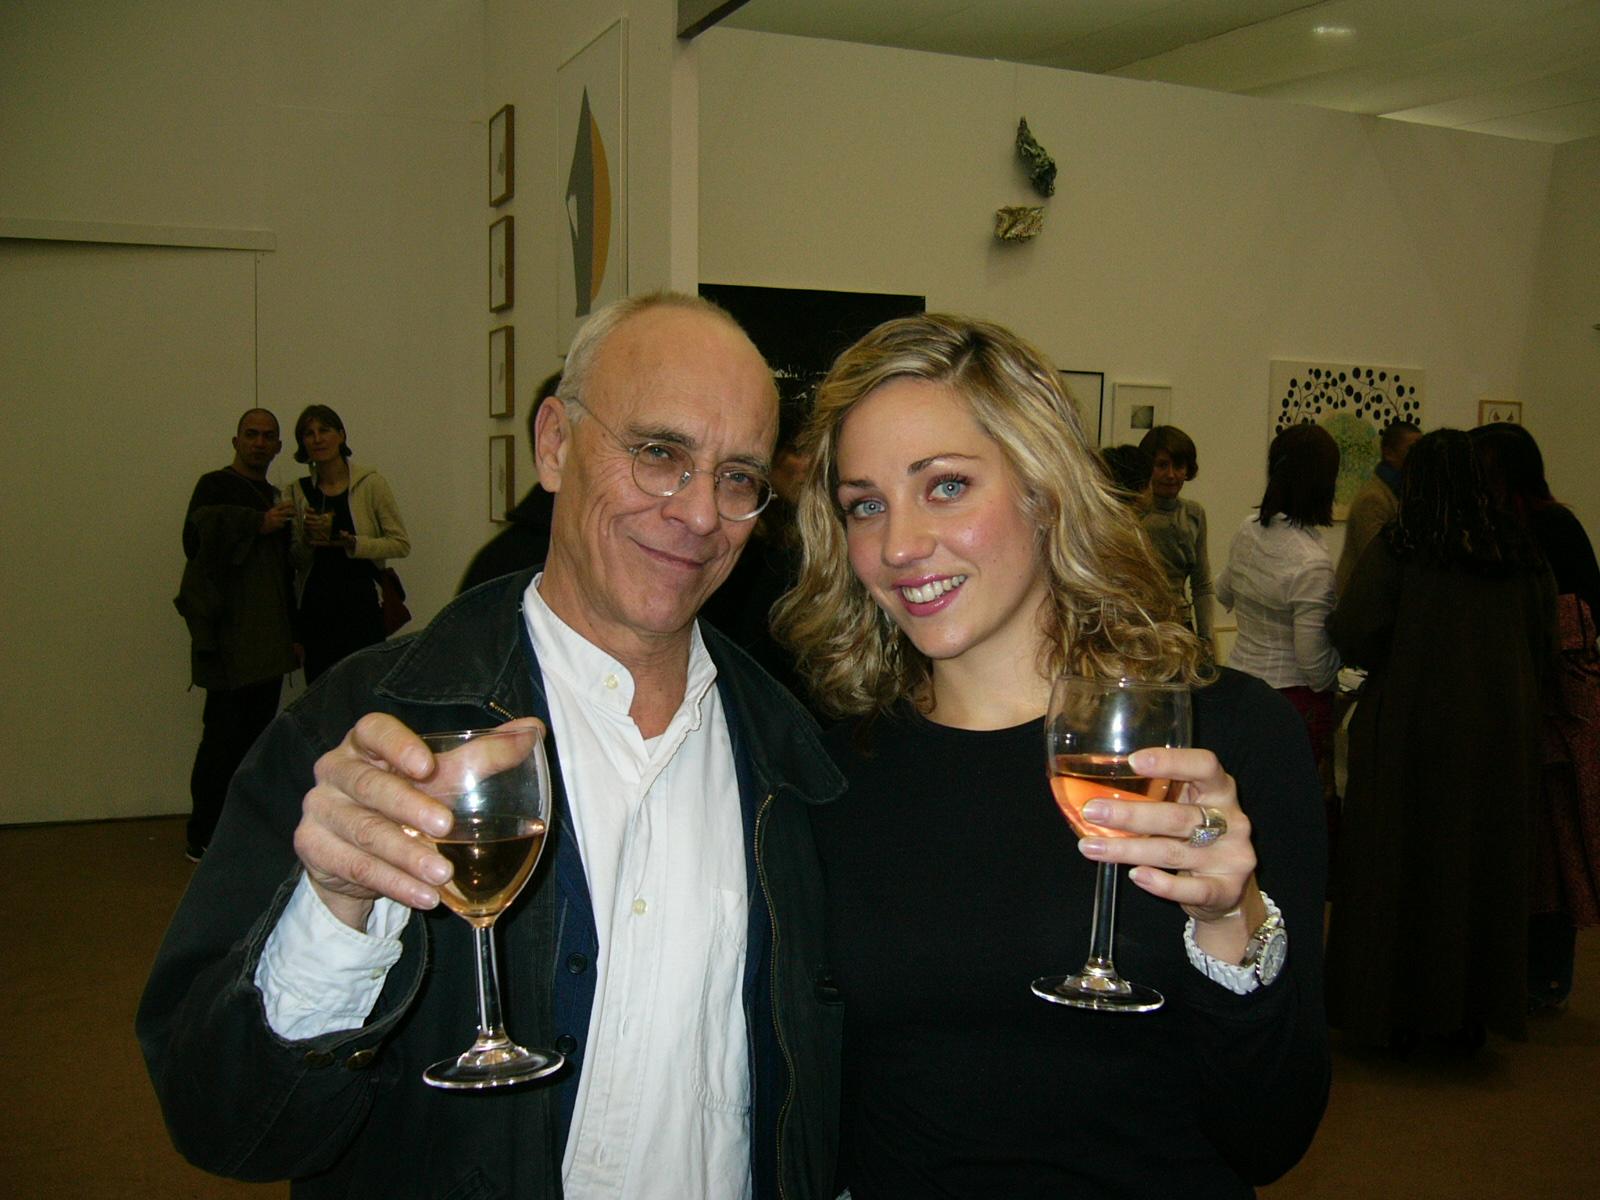 Meeting John Dunbar, at The Frieze Art Fair, 2004